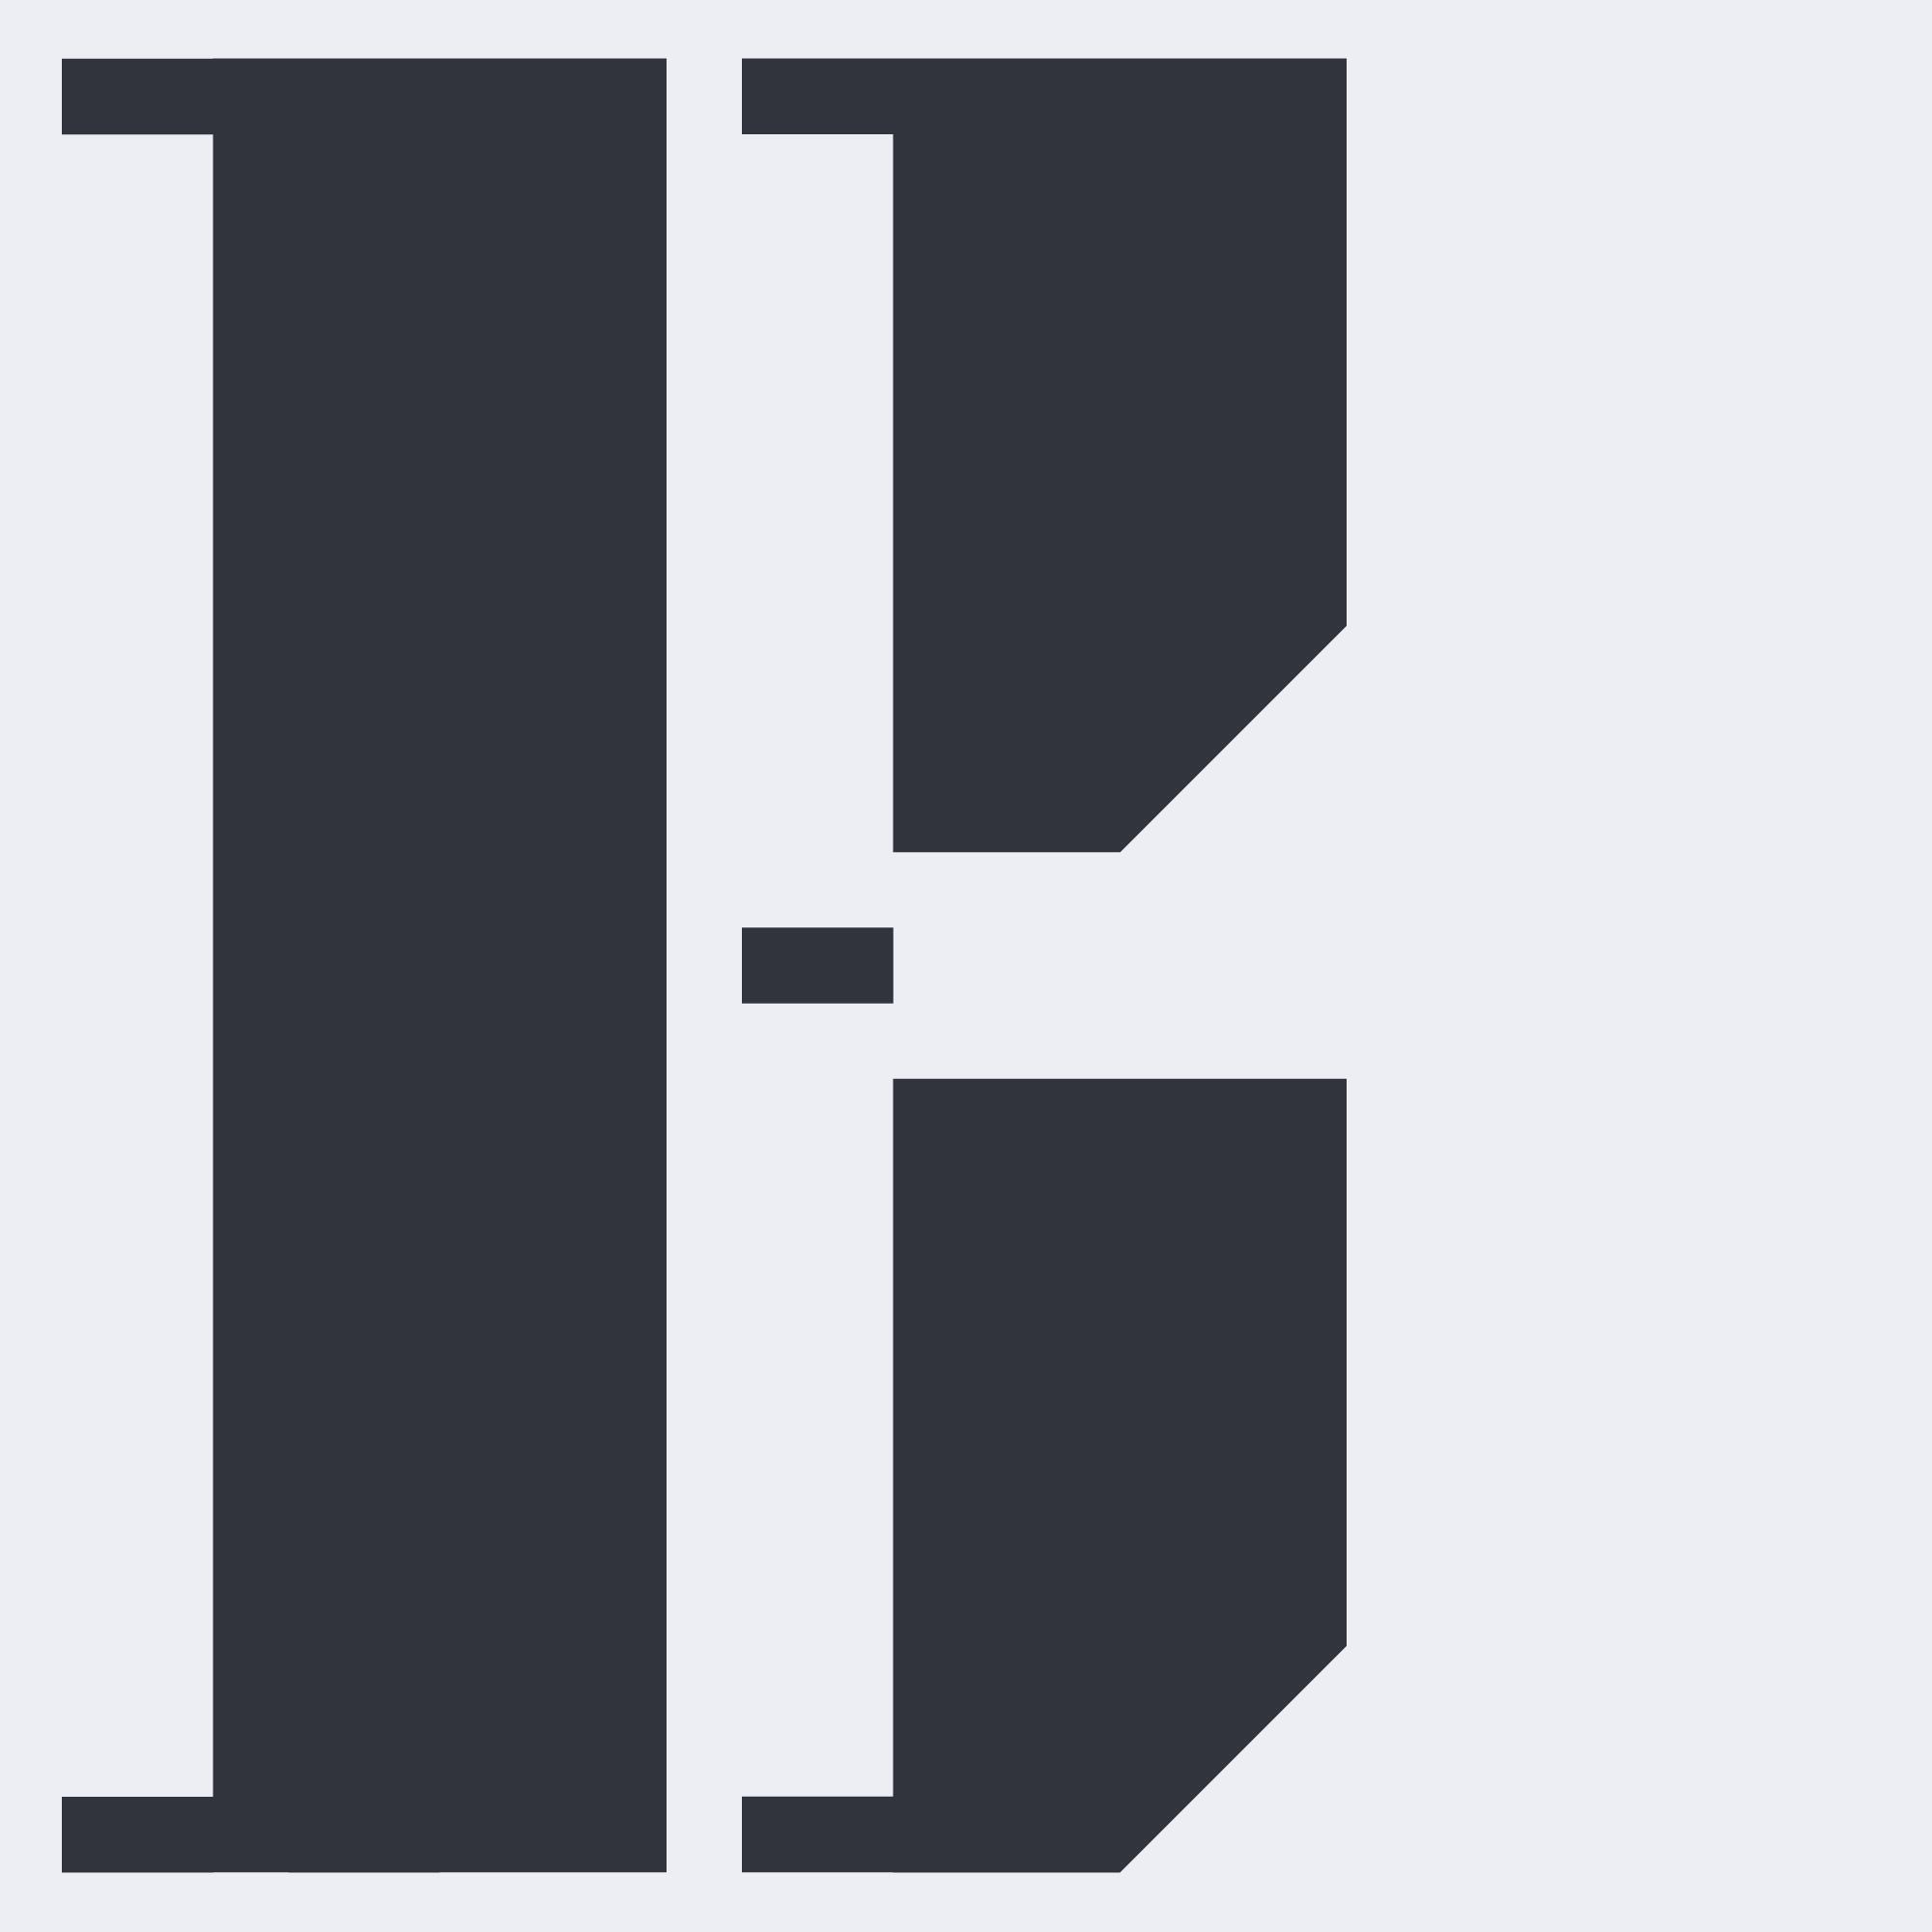 Adaptive typeface concept - eyeondesign - sam_hall | ello